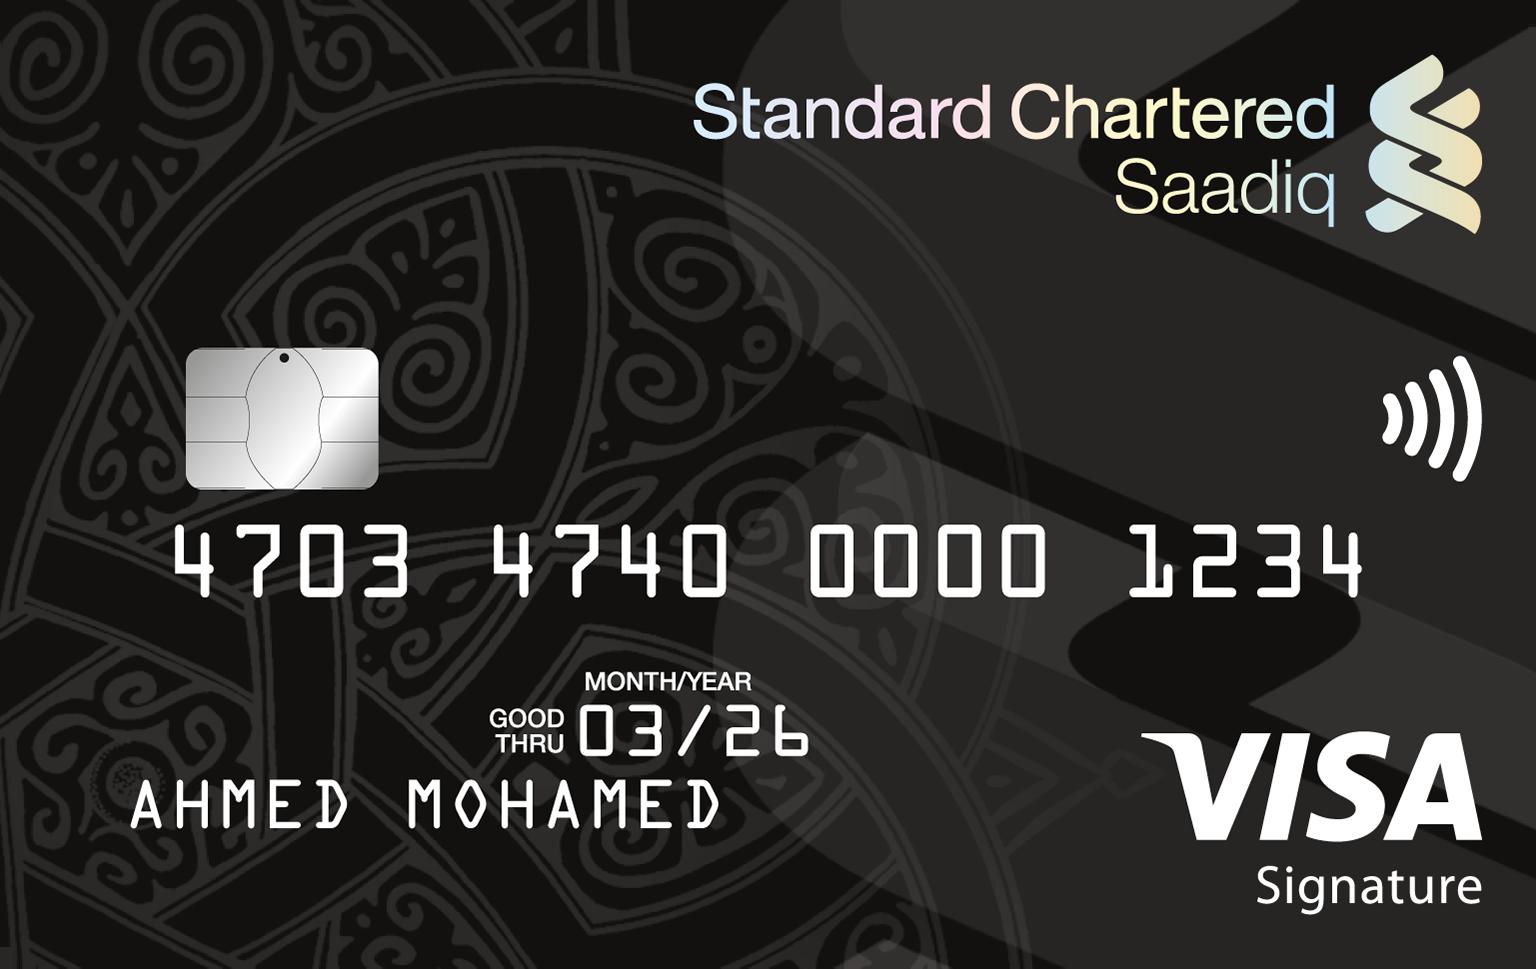 Saadiq Credit Card